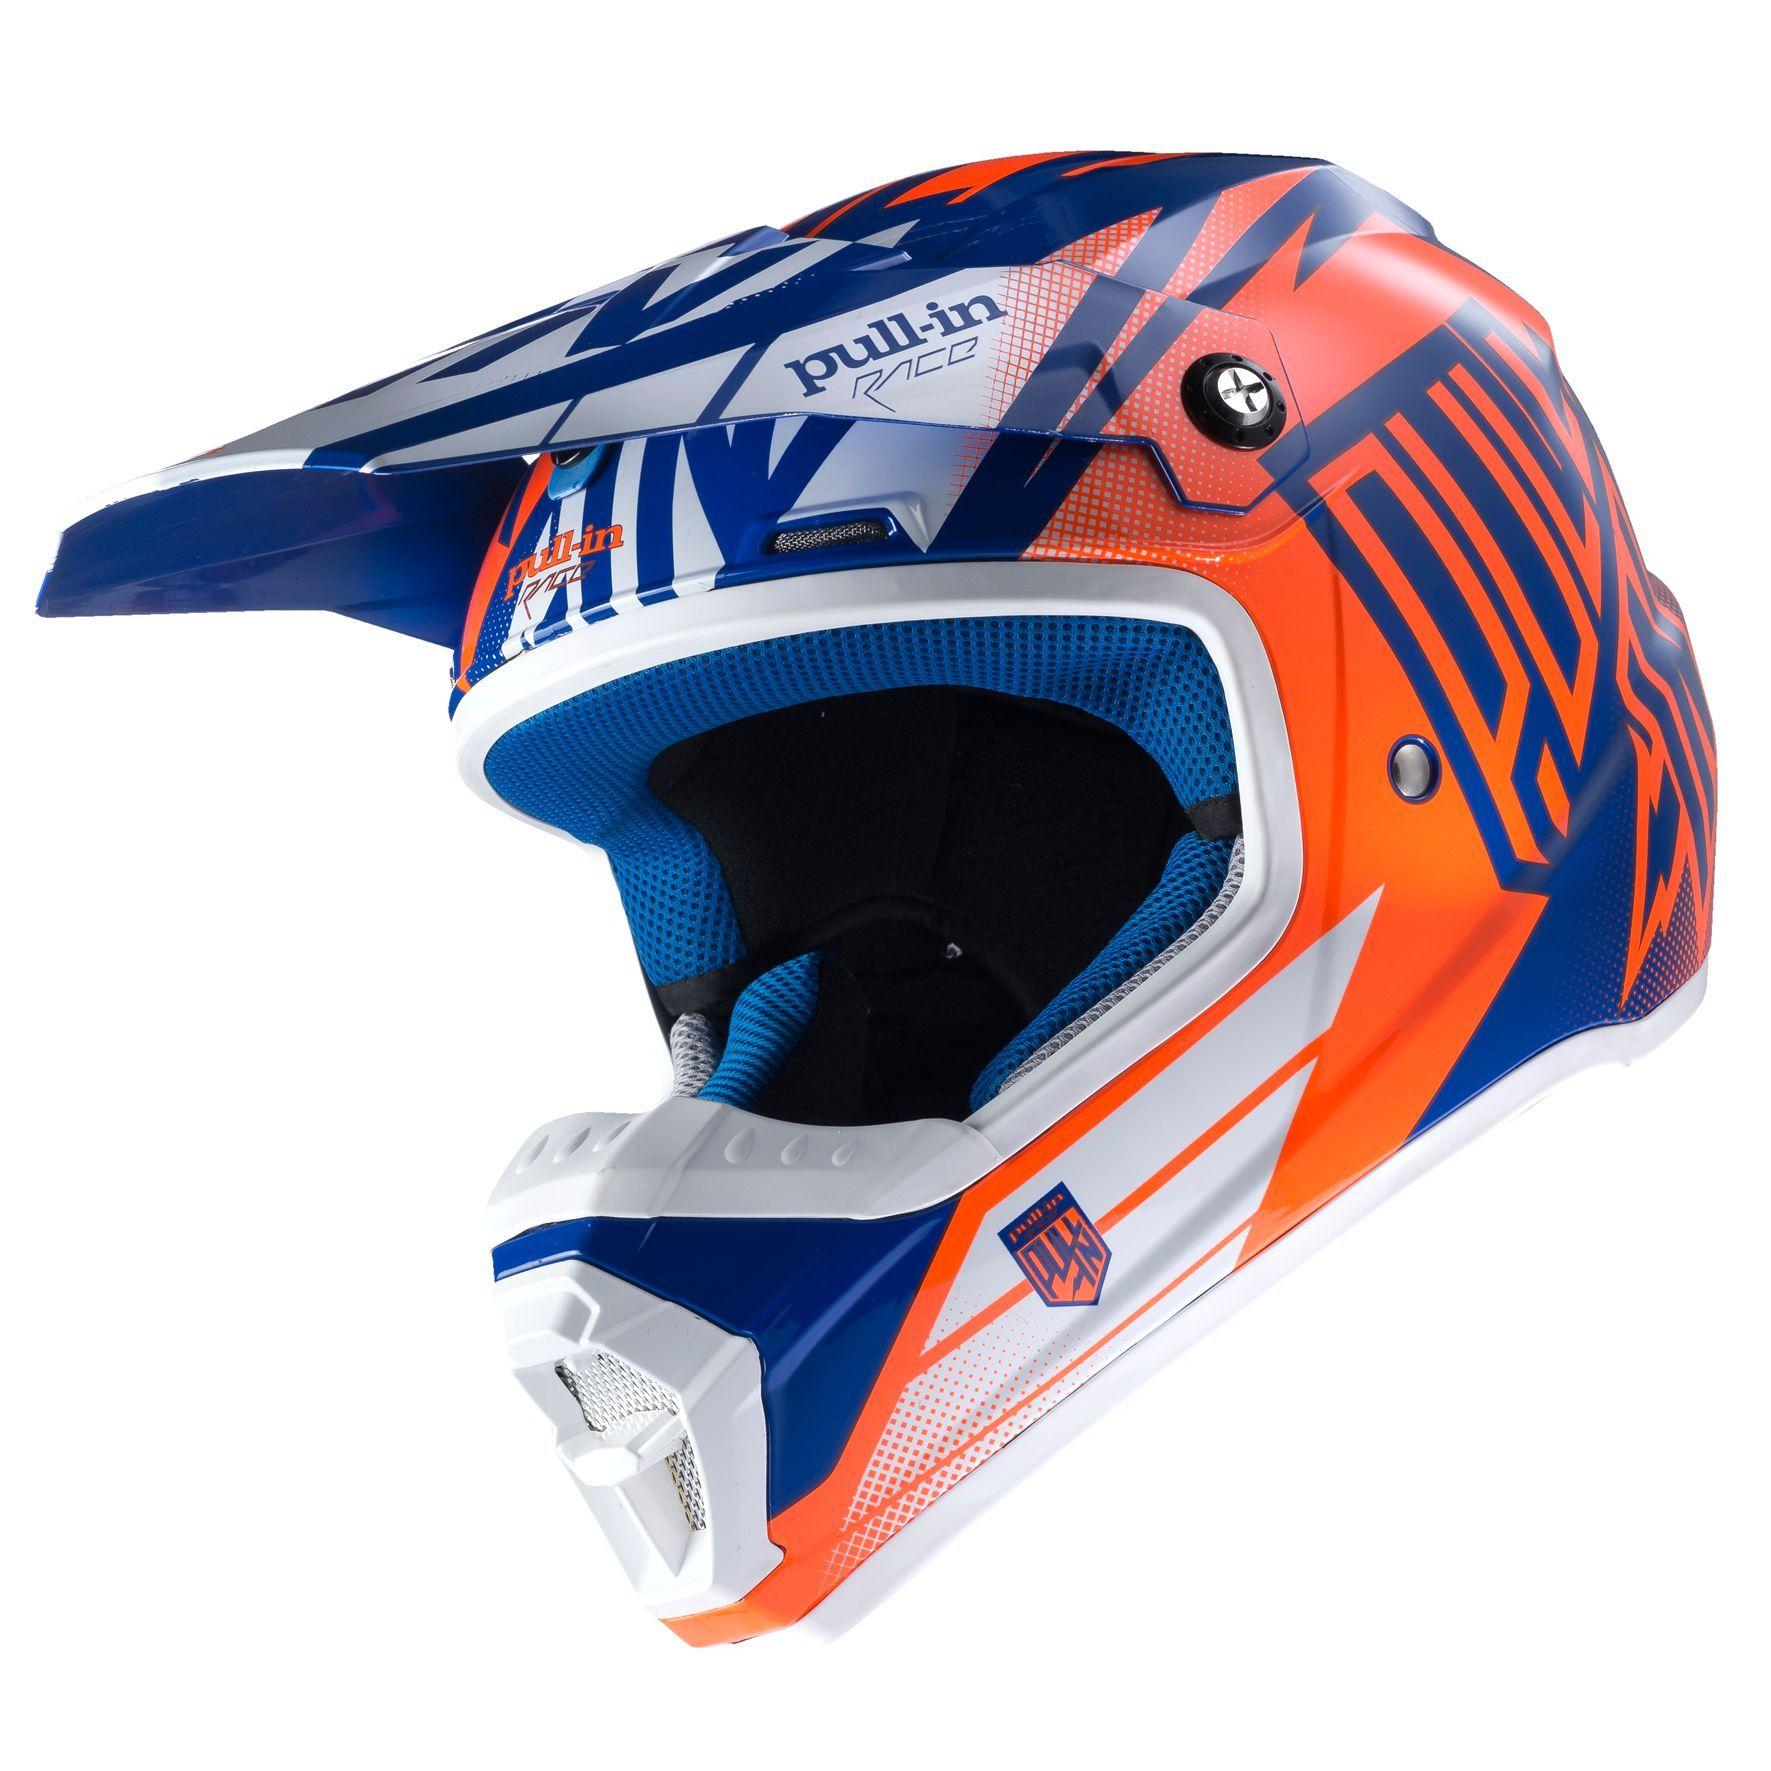 Casque Cross Pull In Destockage Moto Kid Bleu Orange Fluo 4